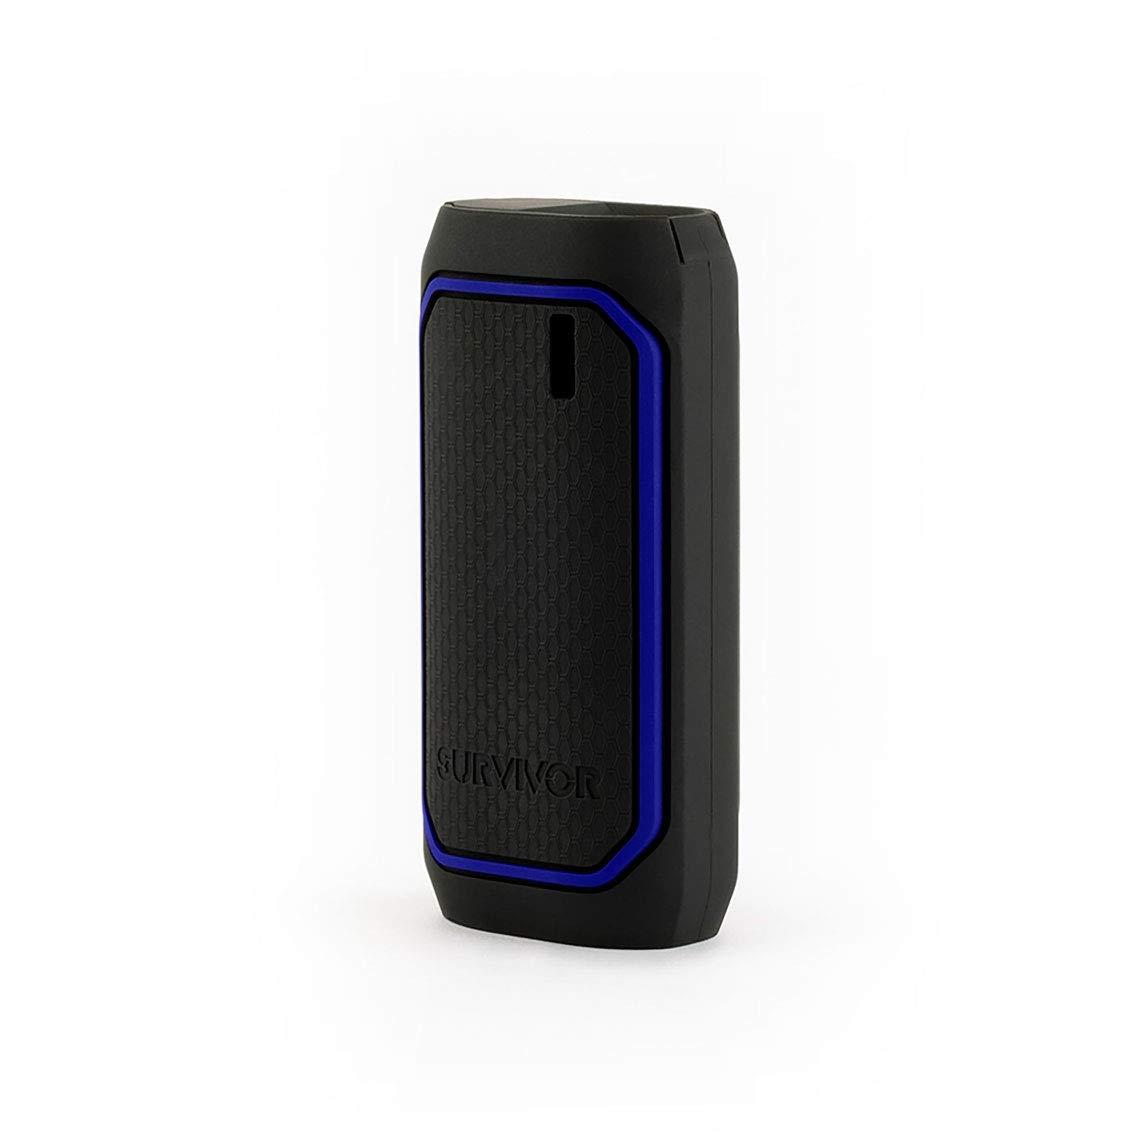 new product 5c064 8536d Amazon.com: Griffin Survivor Power Bank, 6,000 mAh Rugged Portable ...